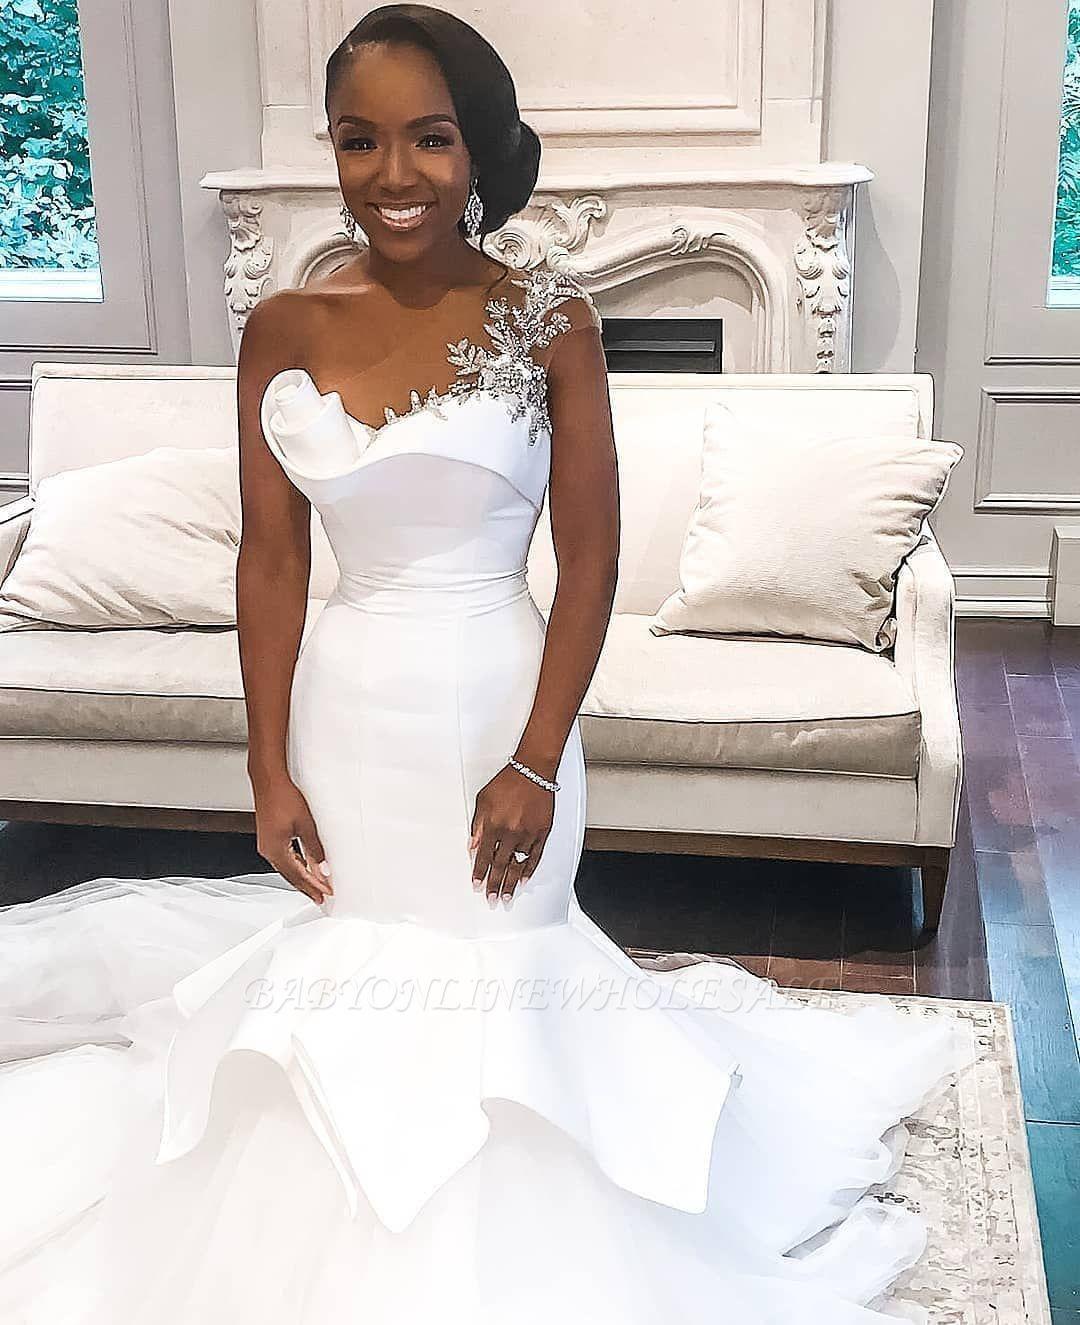 One Shoulder White Mermaid Bridal Gowns With Ruffle Train Wedding Dresses Mermaid Wedding Dress Bridal Dresses [ 1325 x 1080 Pixel ]